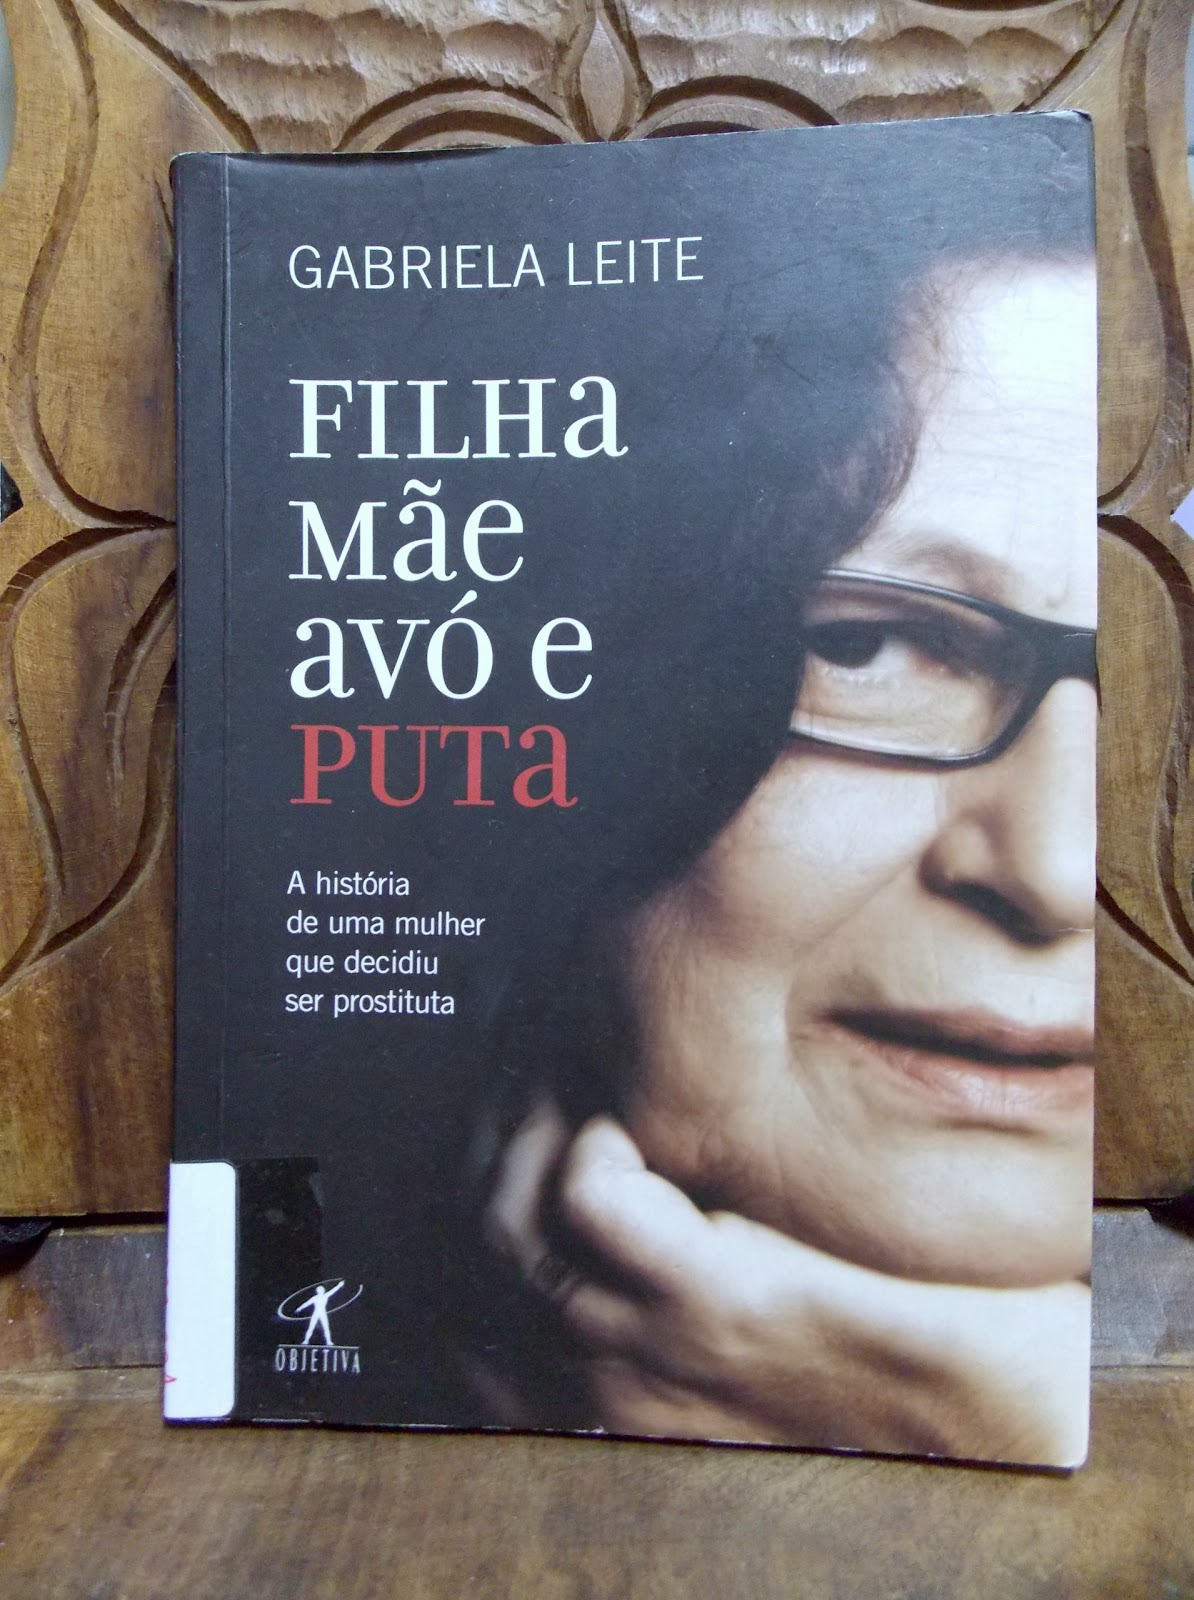 BLOG DO EDNEY: FILHA MÃE AVÓ E PUTA Morre ex prostituta Gabriela  #7A6349 1194 1600